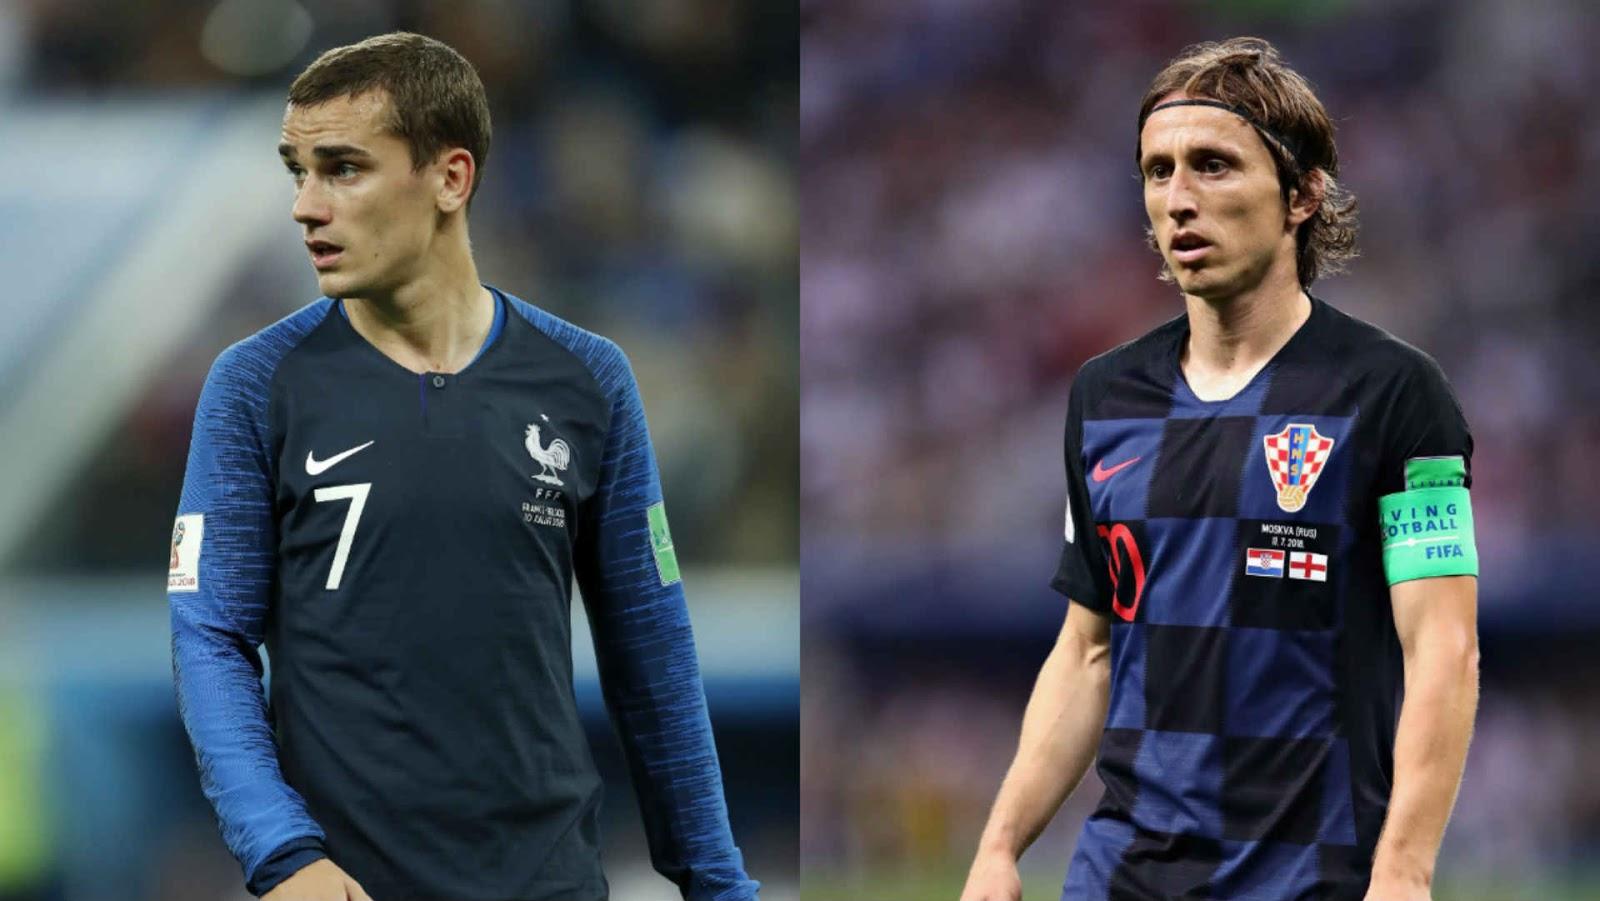 نهائي مونديال 2018 اليوم - مشاهدة مباراة فرنسا وكرواتيا